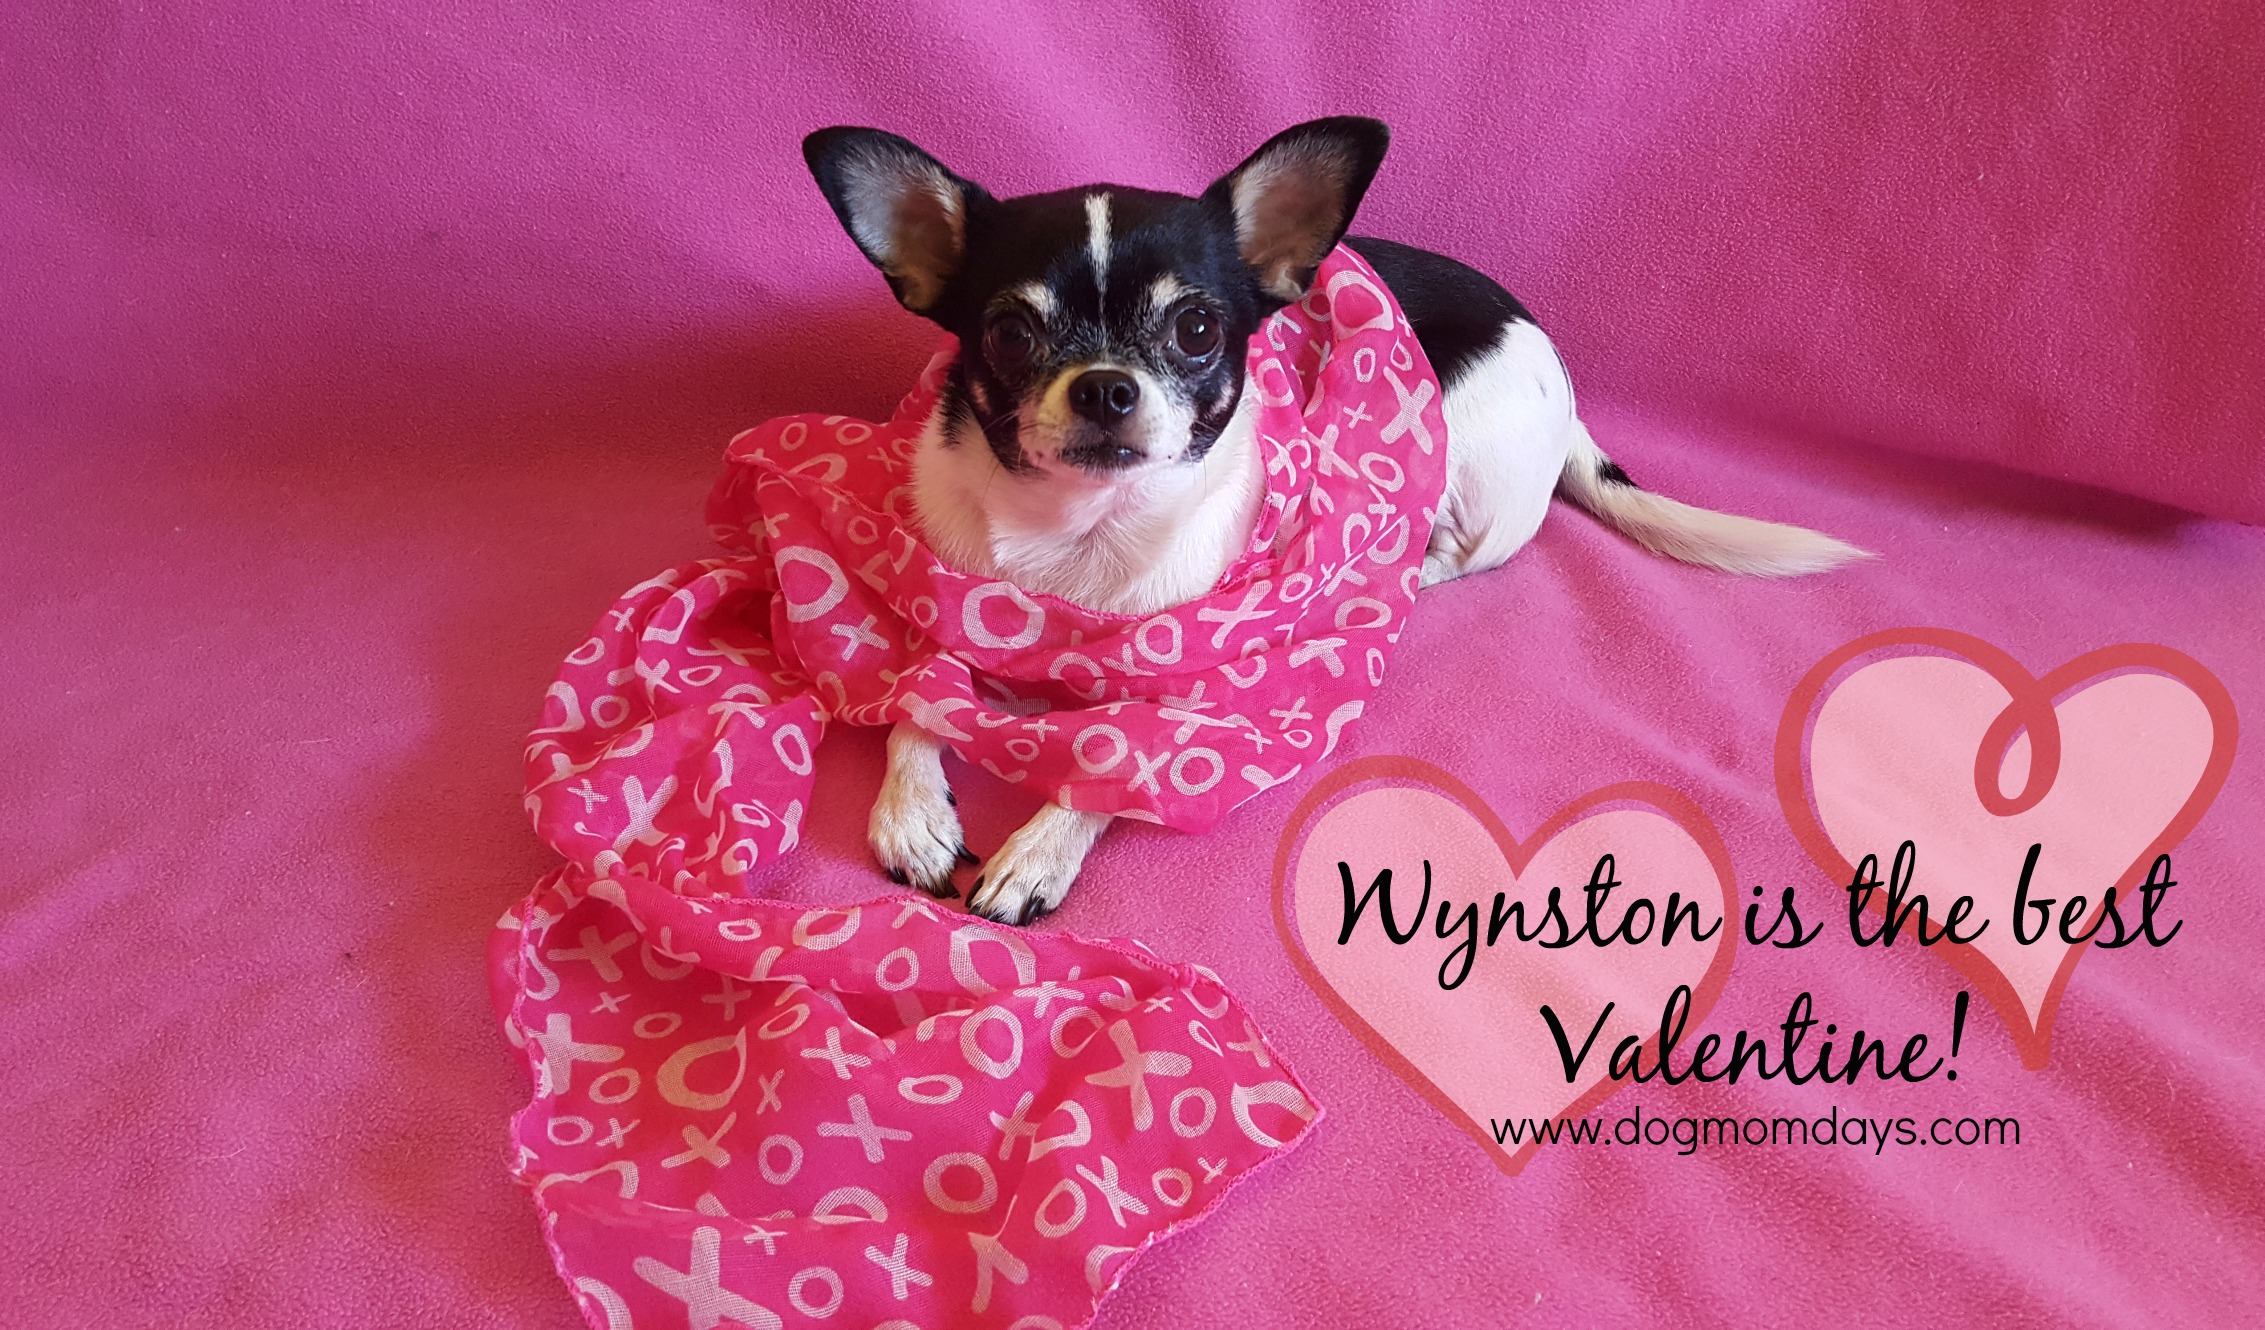 Chihuahua Valentine's Day